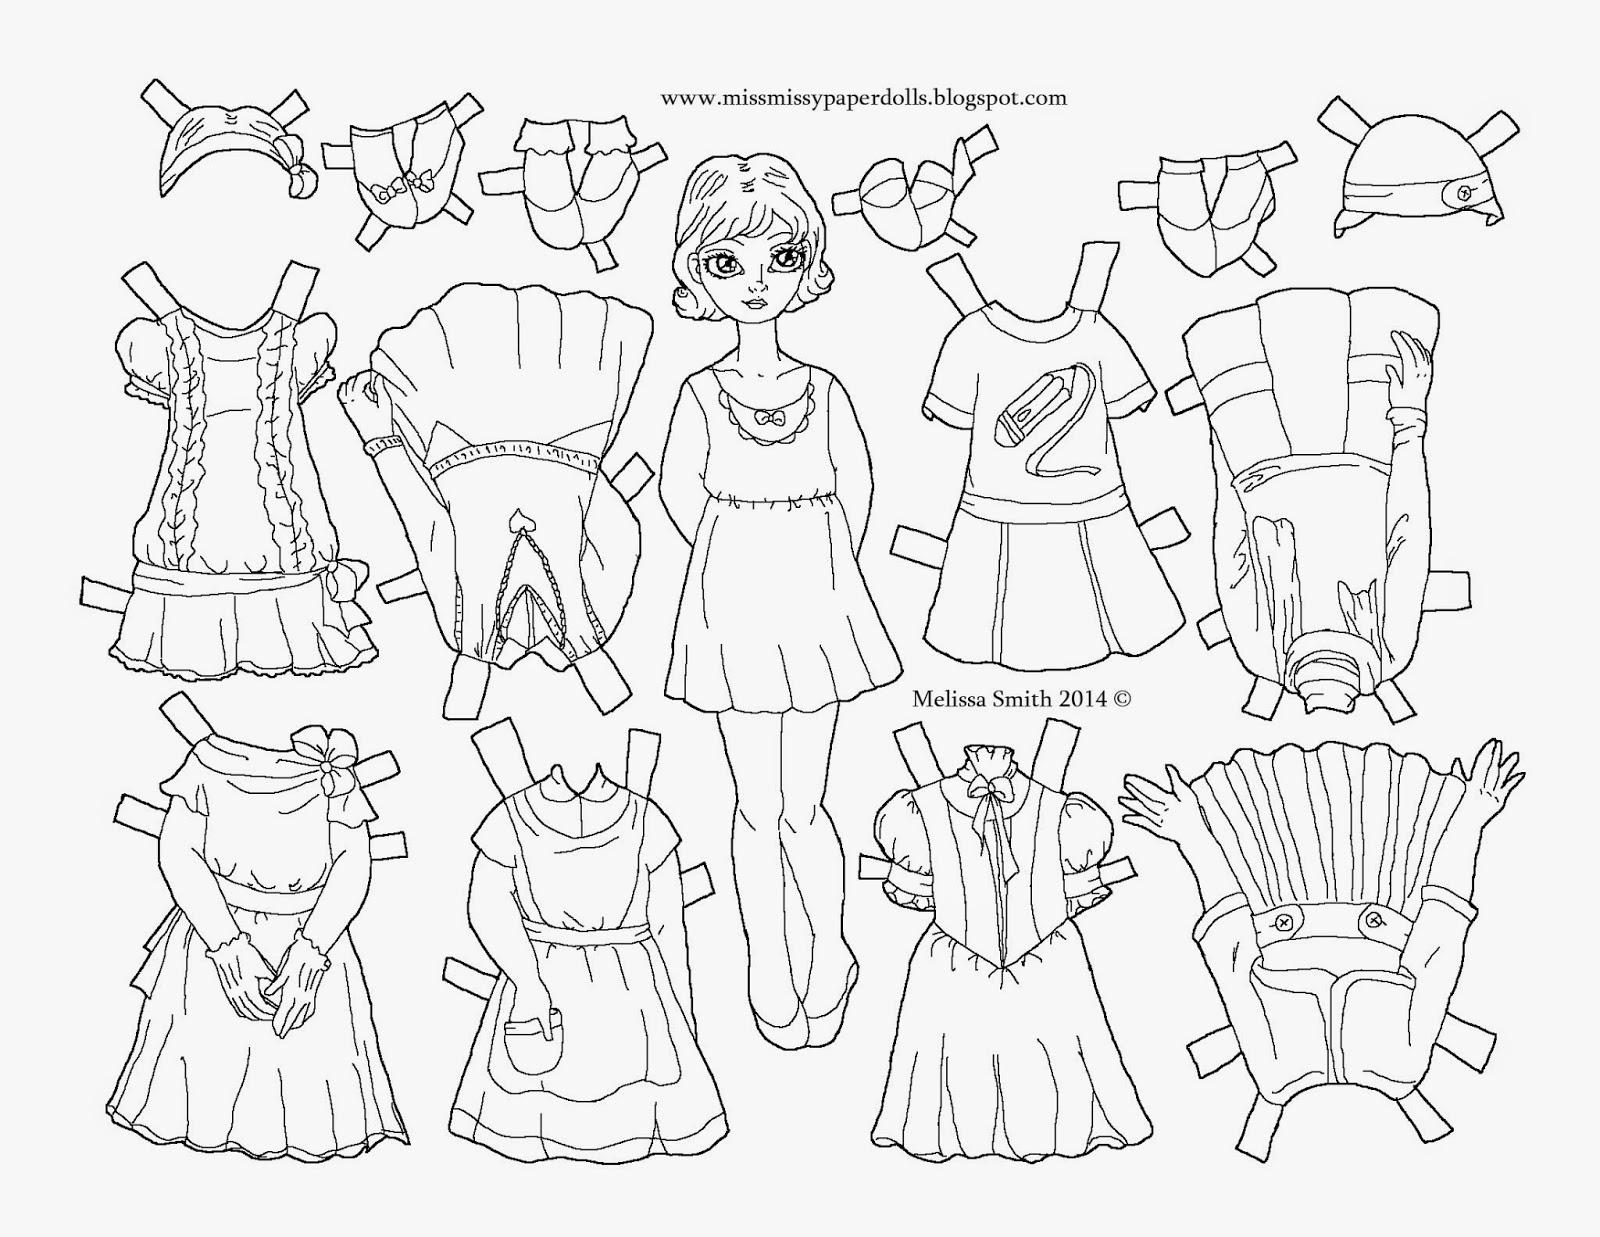 miss missy paper dolls may 2014. Black Bedroom Furniture Sets. Home Design Ideas